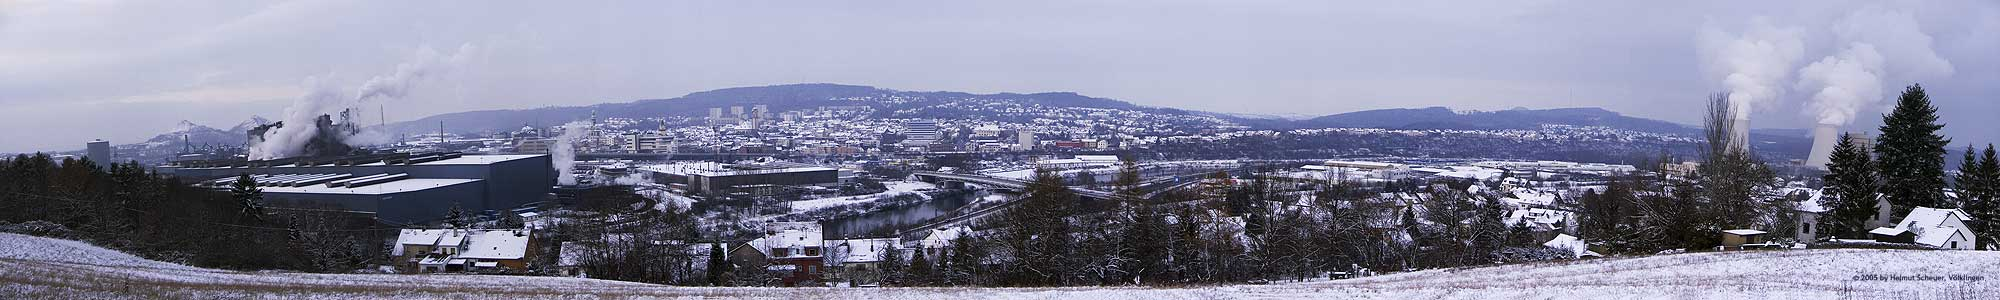 Winterpanorama von Völklingen/Saar